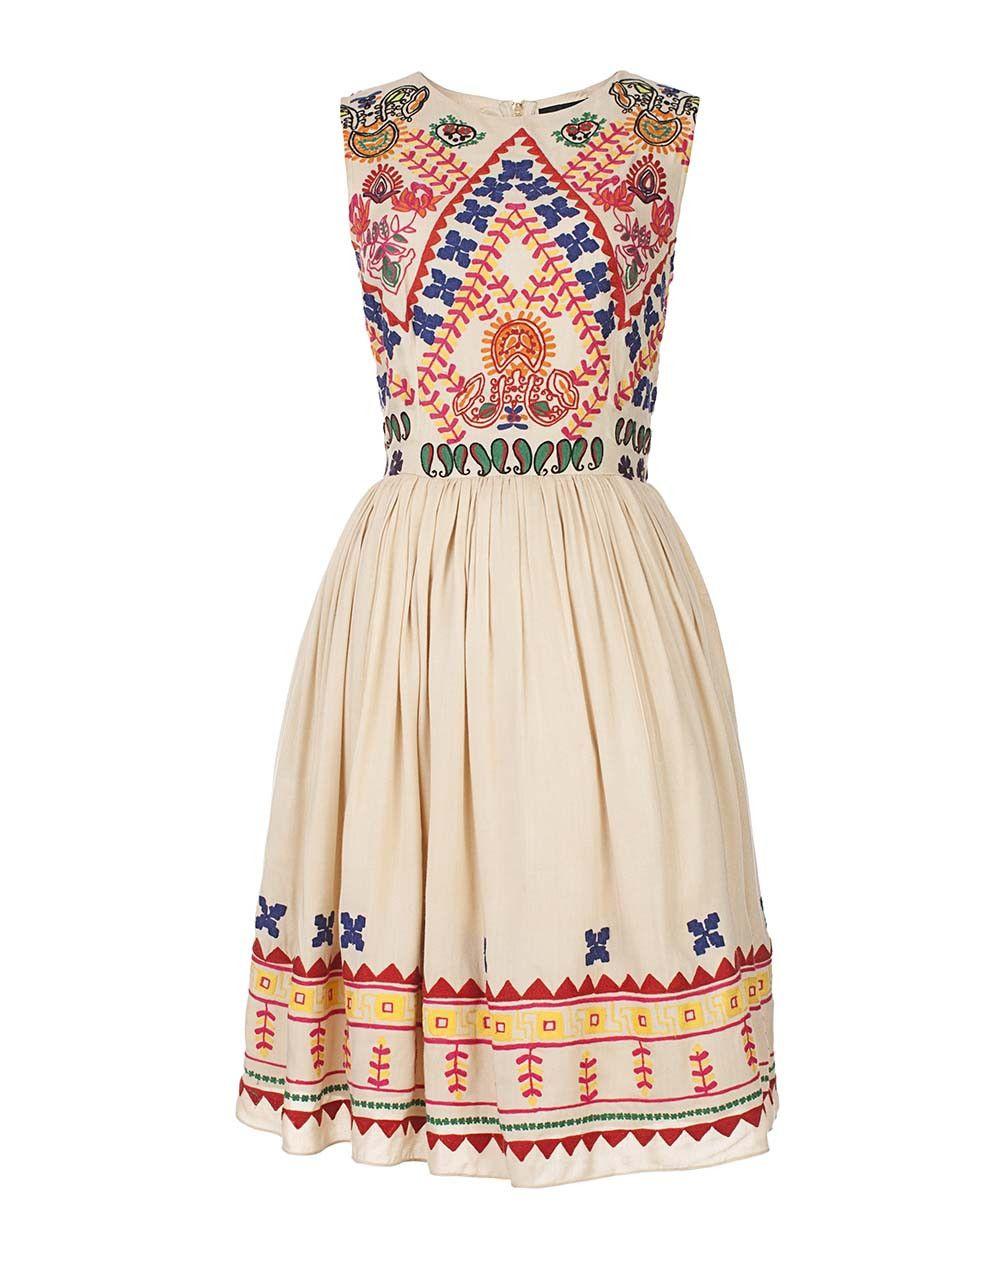 4201afd664e The Baby Doll Embroidered Dress   Stiler mod stil.   Dresses ...